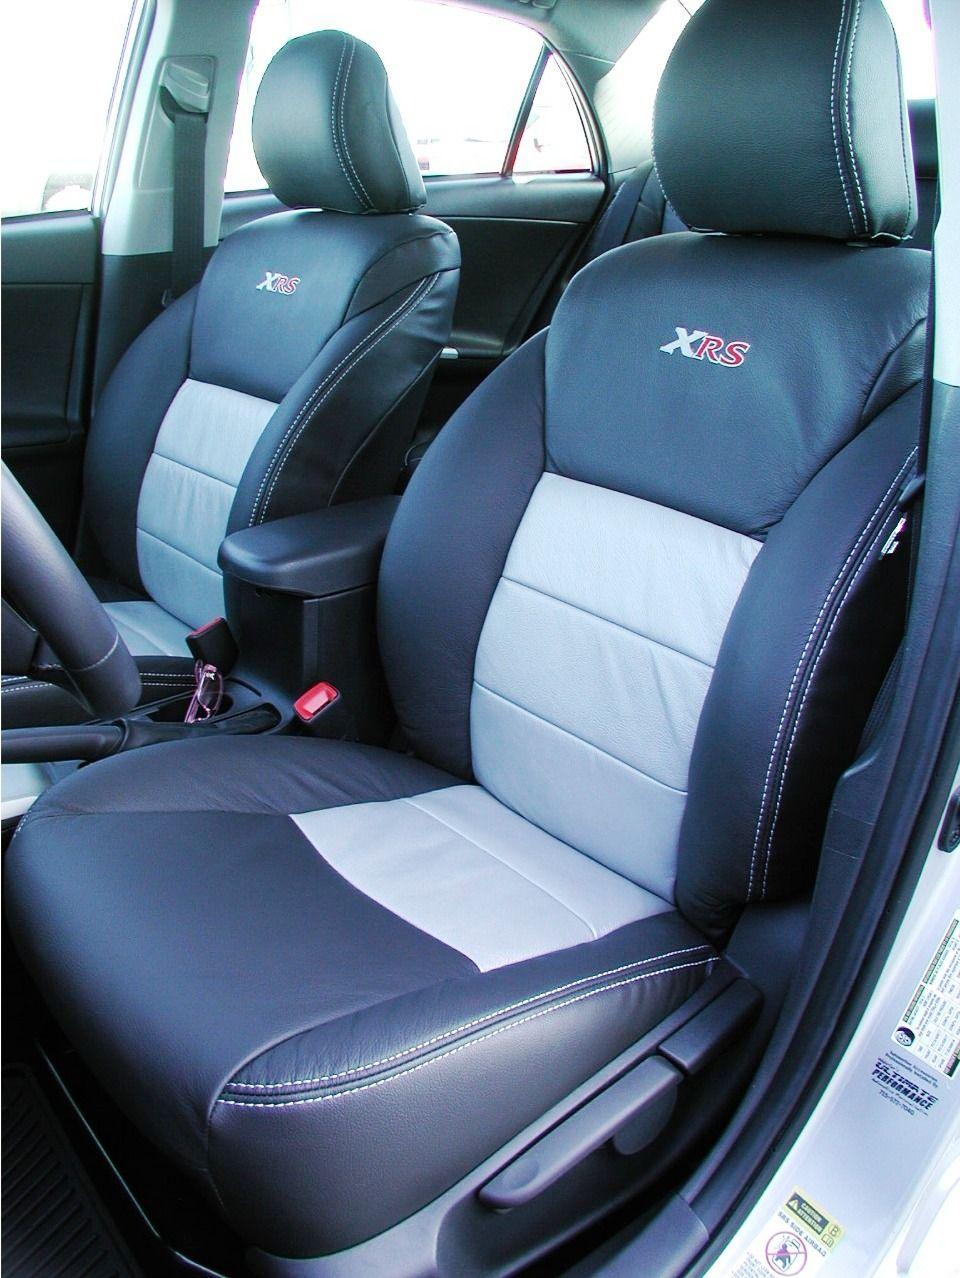 Toyota corolla xrs custom automotive leather seats